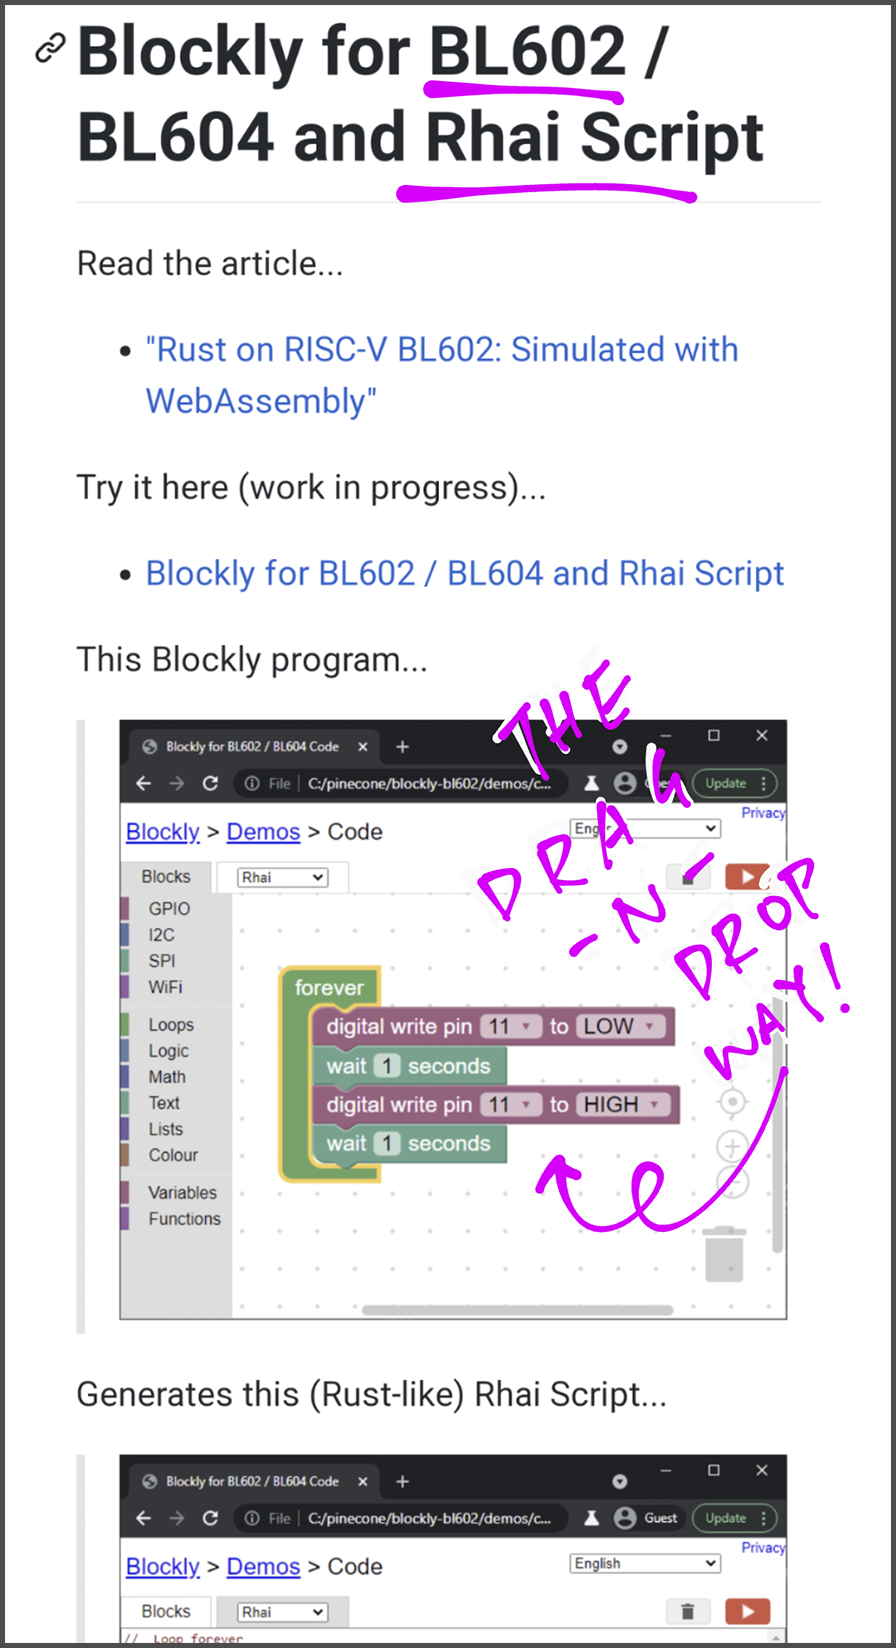 Blockly for BL602 / BL604 and Rhai Script